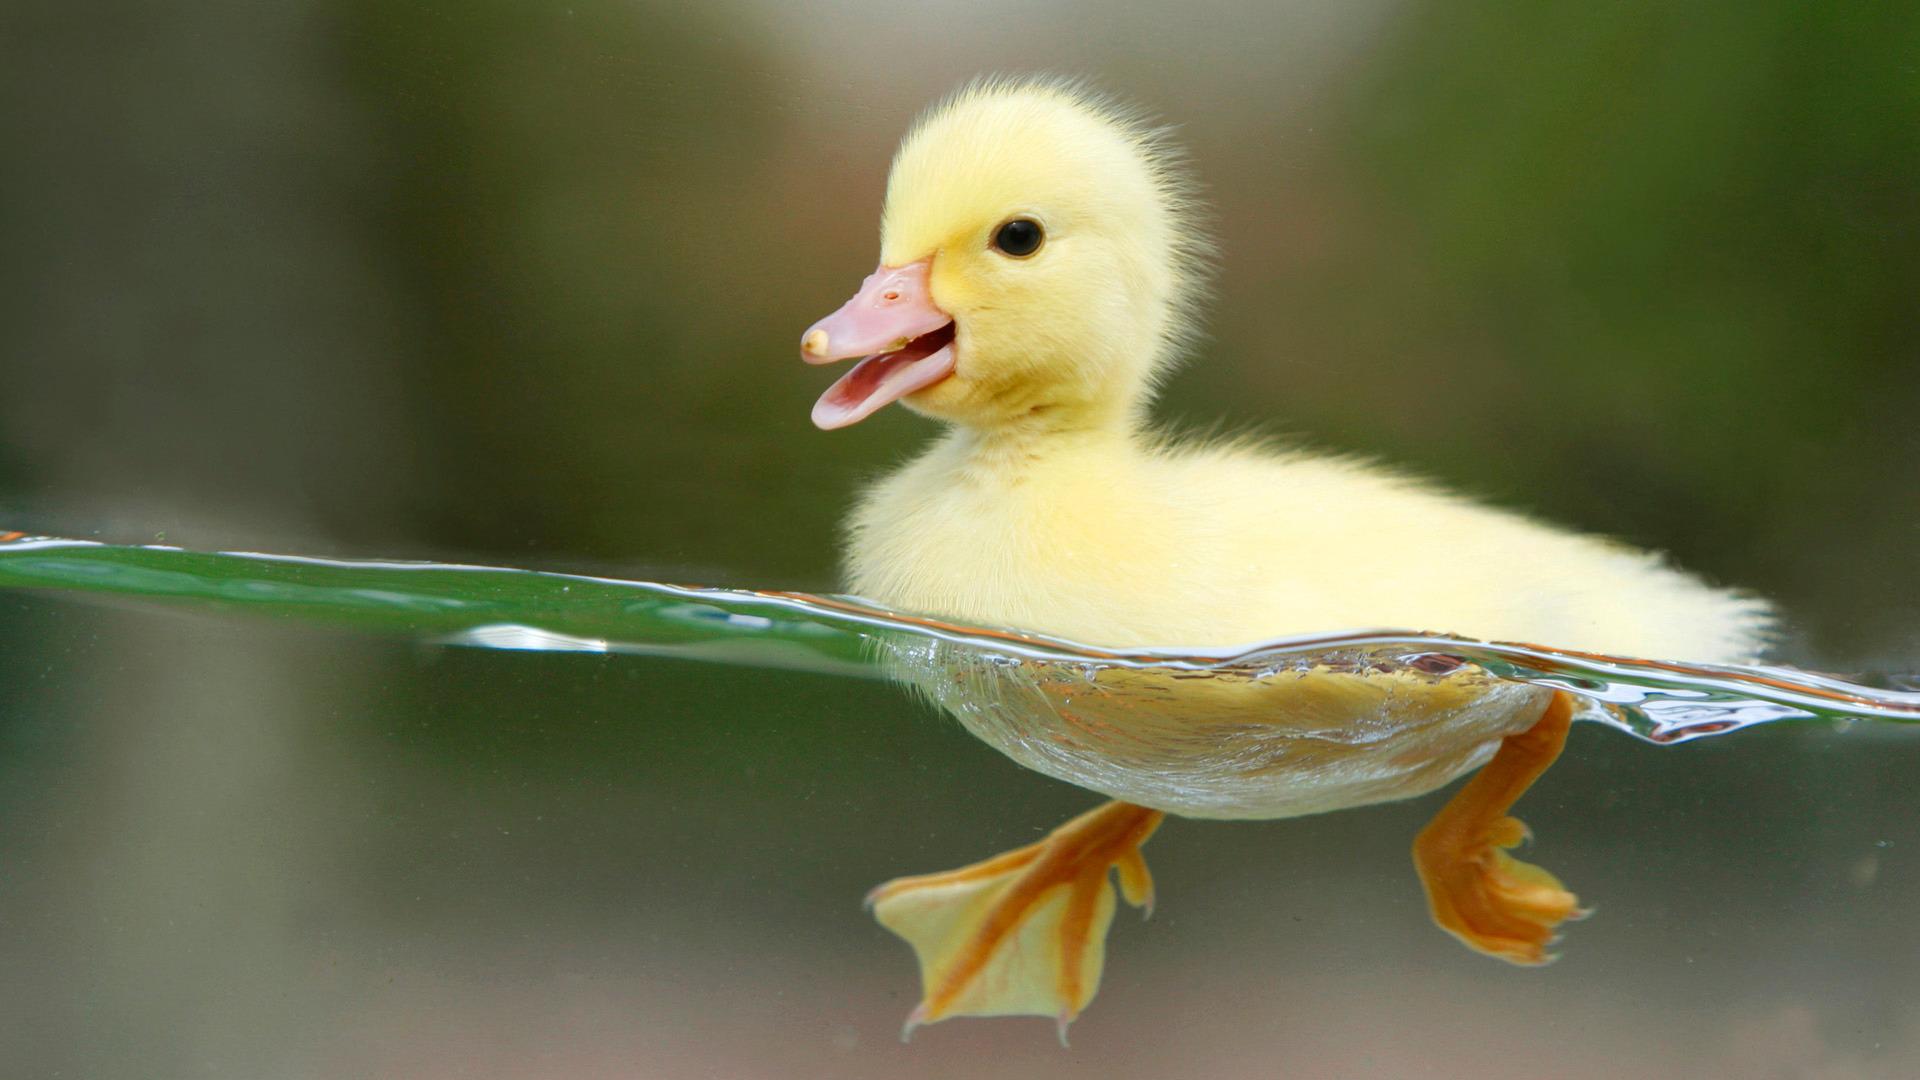 Duckling · Duckling · Duckling · Duckling · Duckling Pictures ...